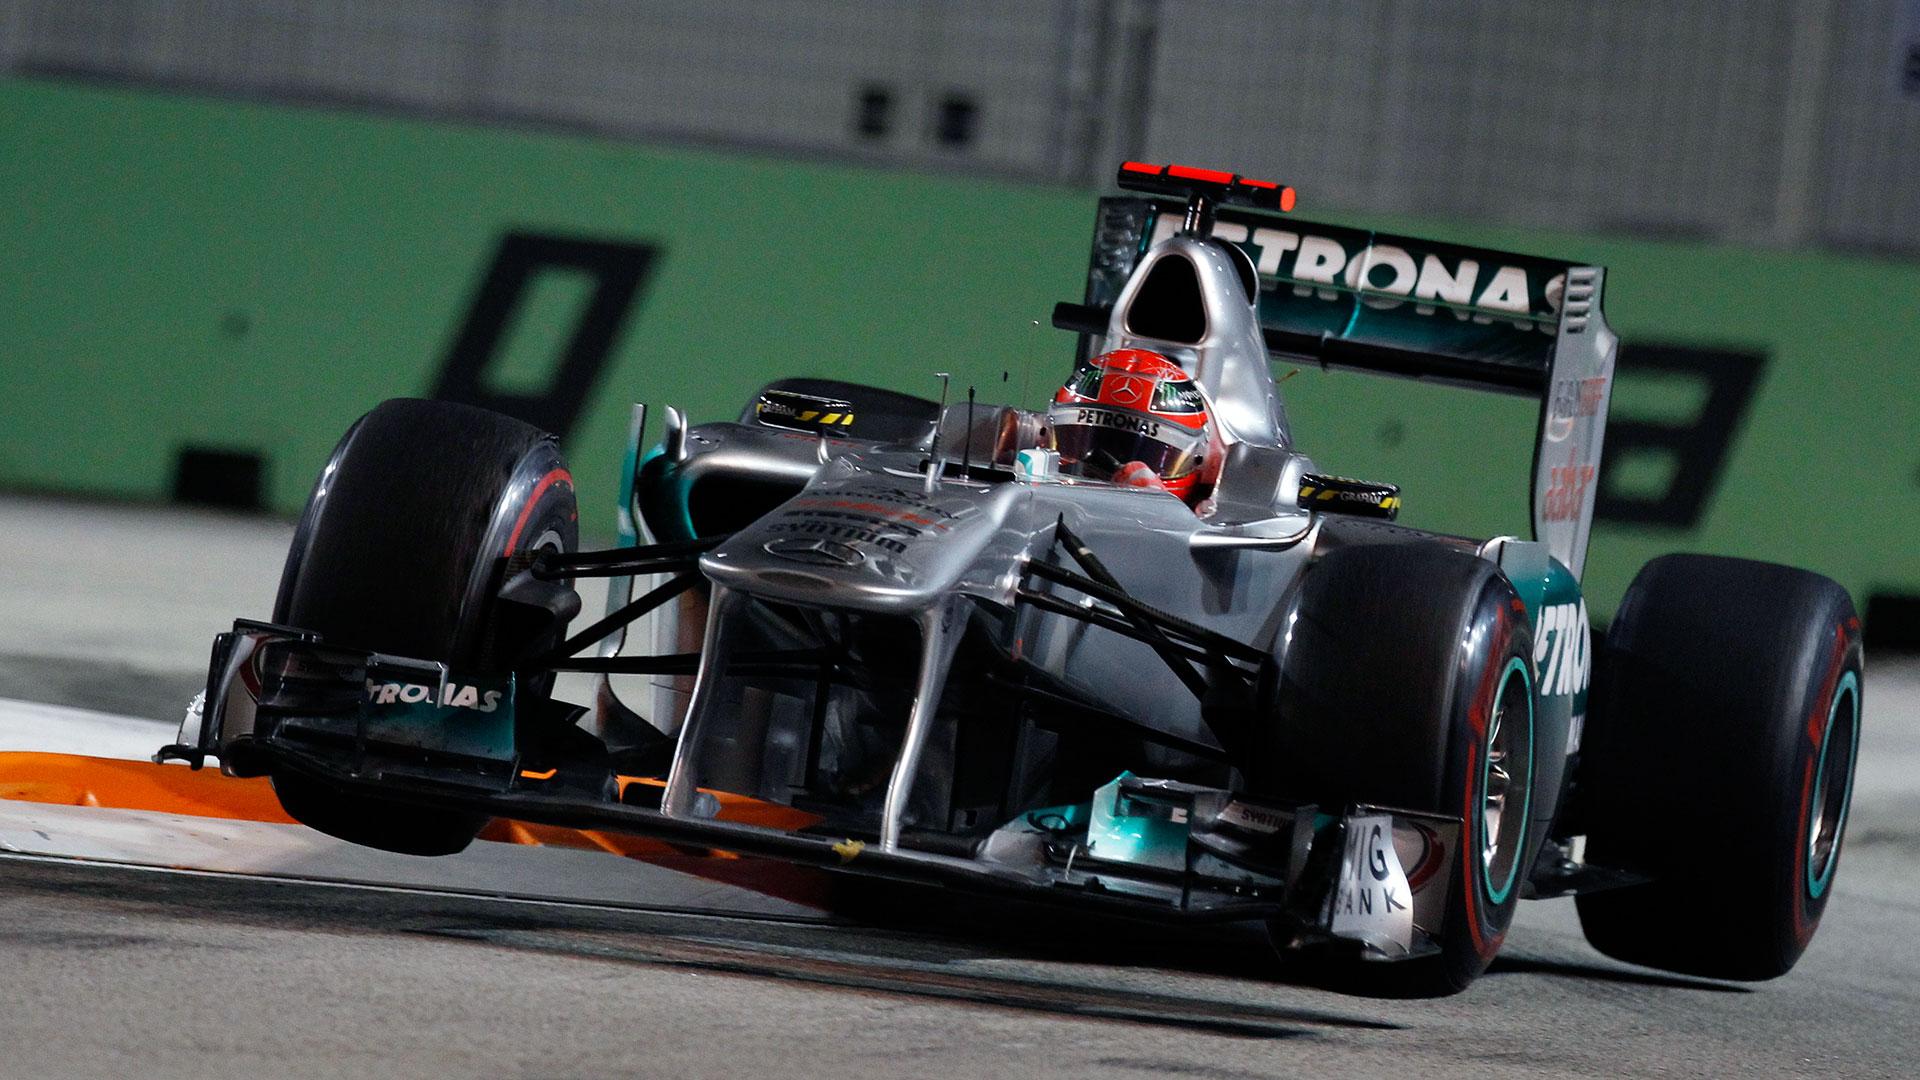 Formula One - Wikipedia